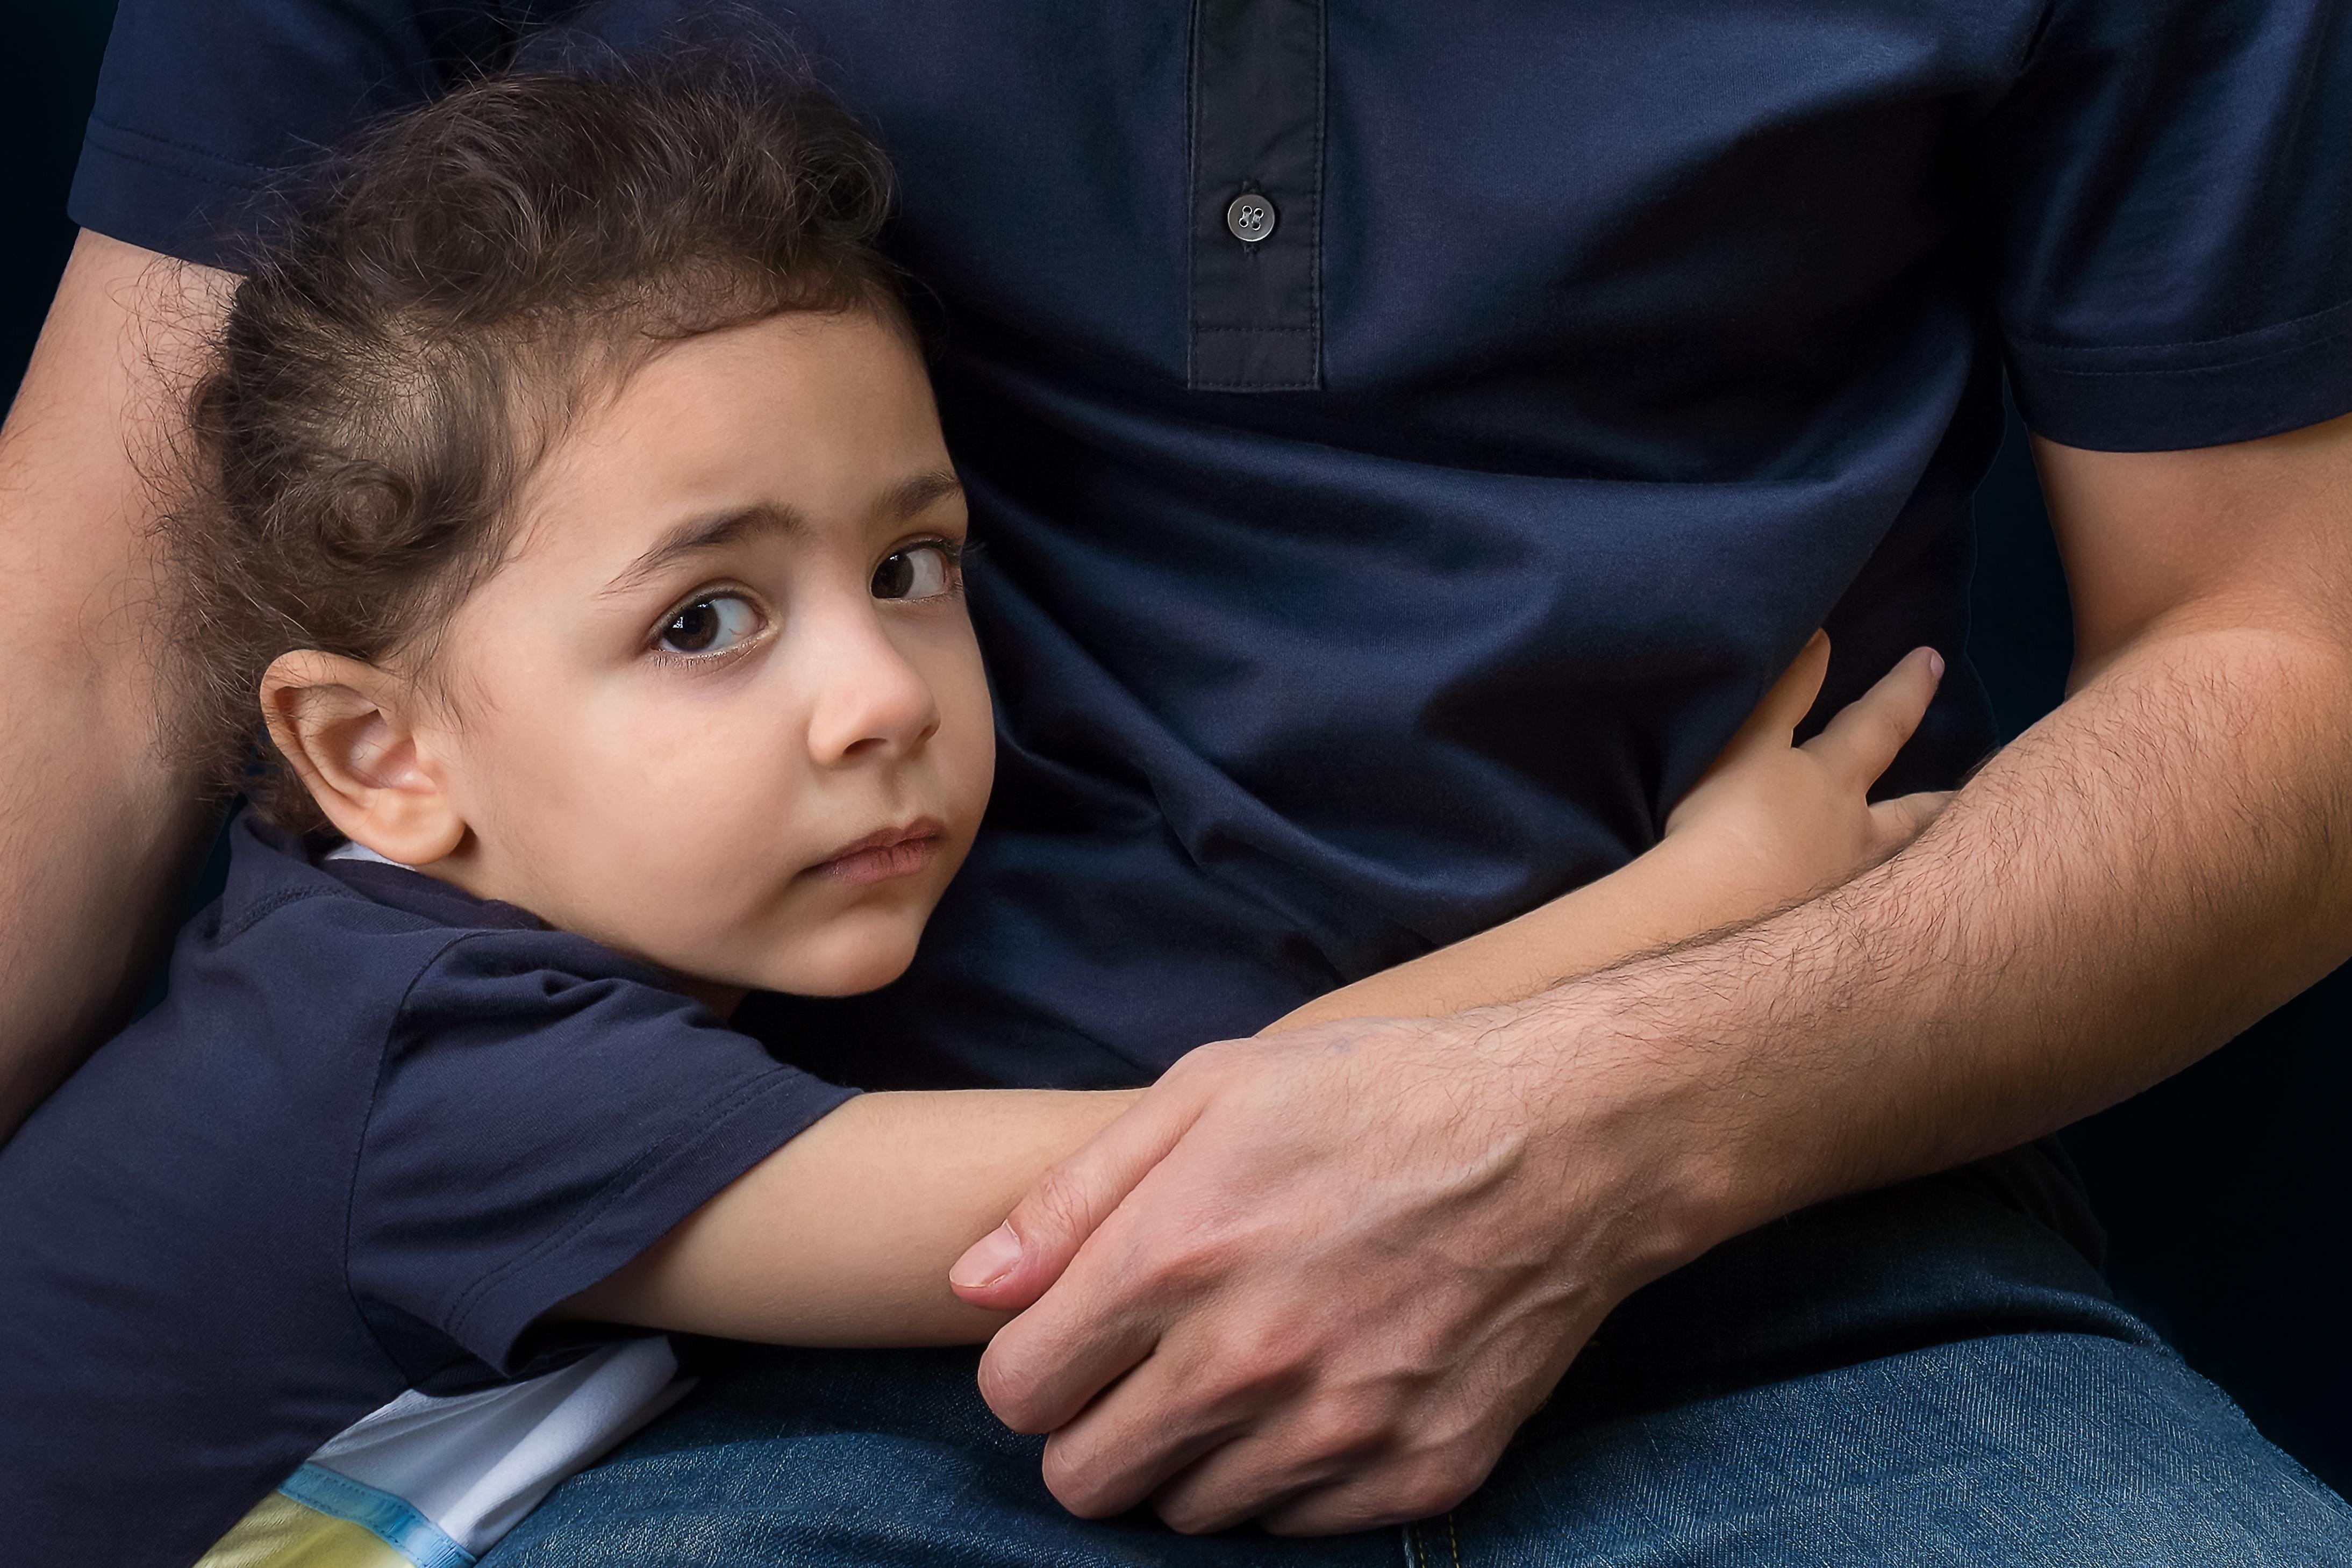 Child Custody Laws in Texas, Child Custody Laws Texas